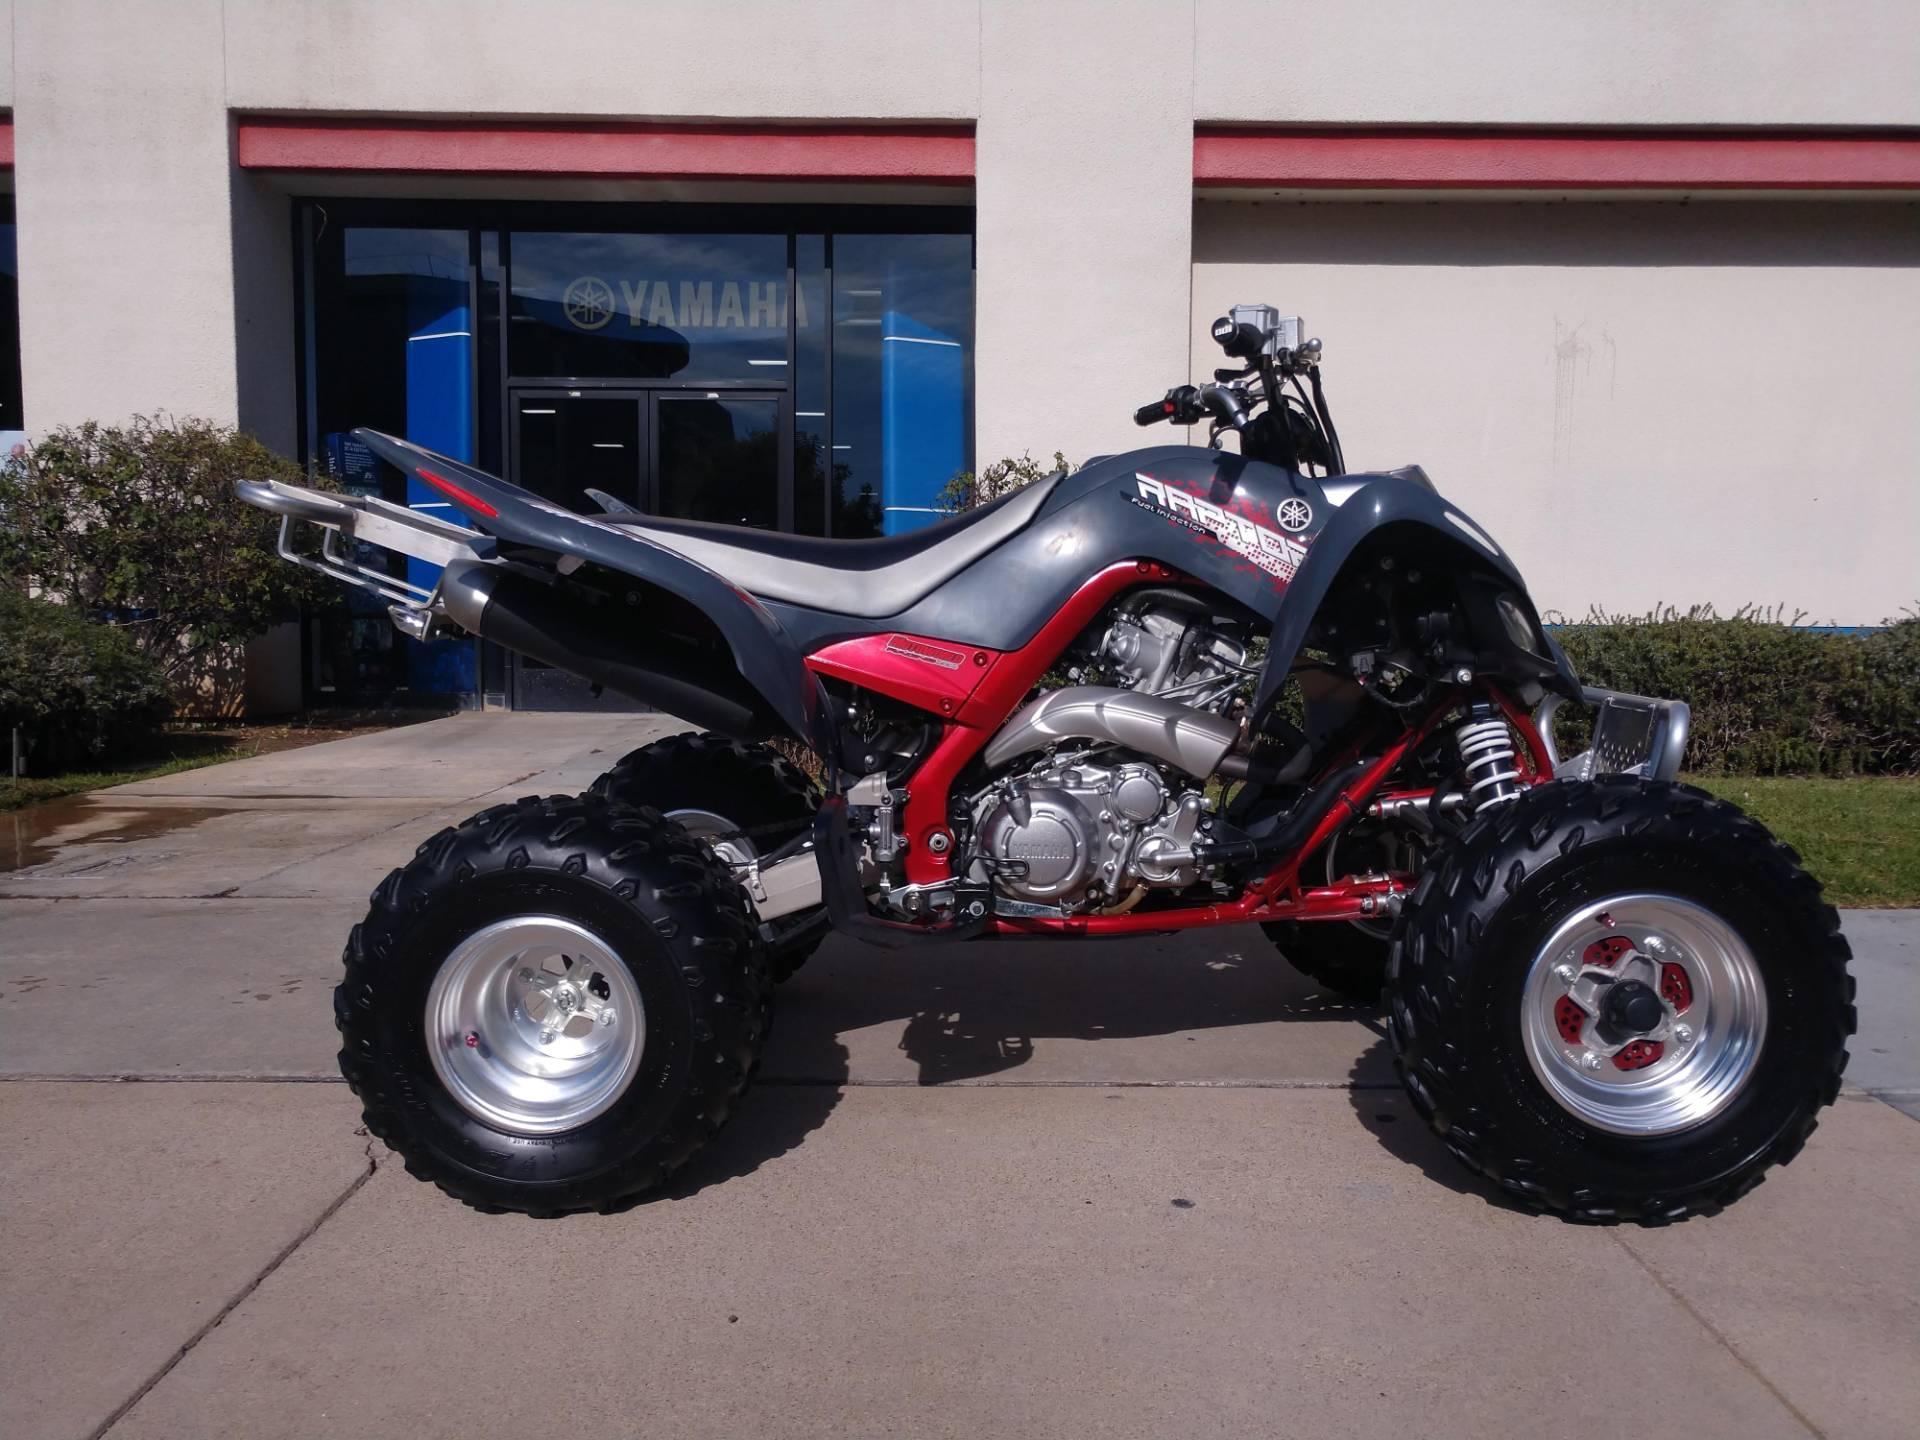 2007 Yamaha Raptor 700R 1